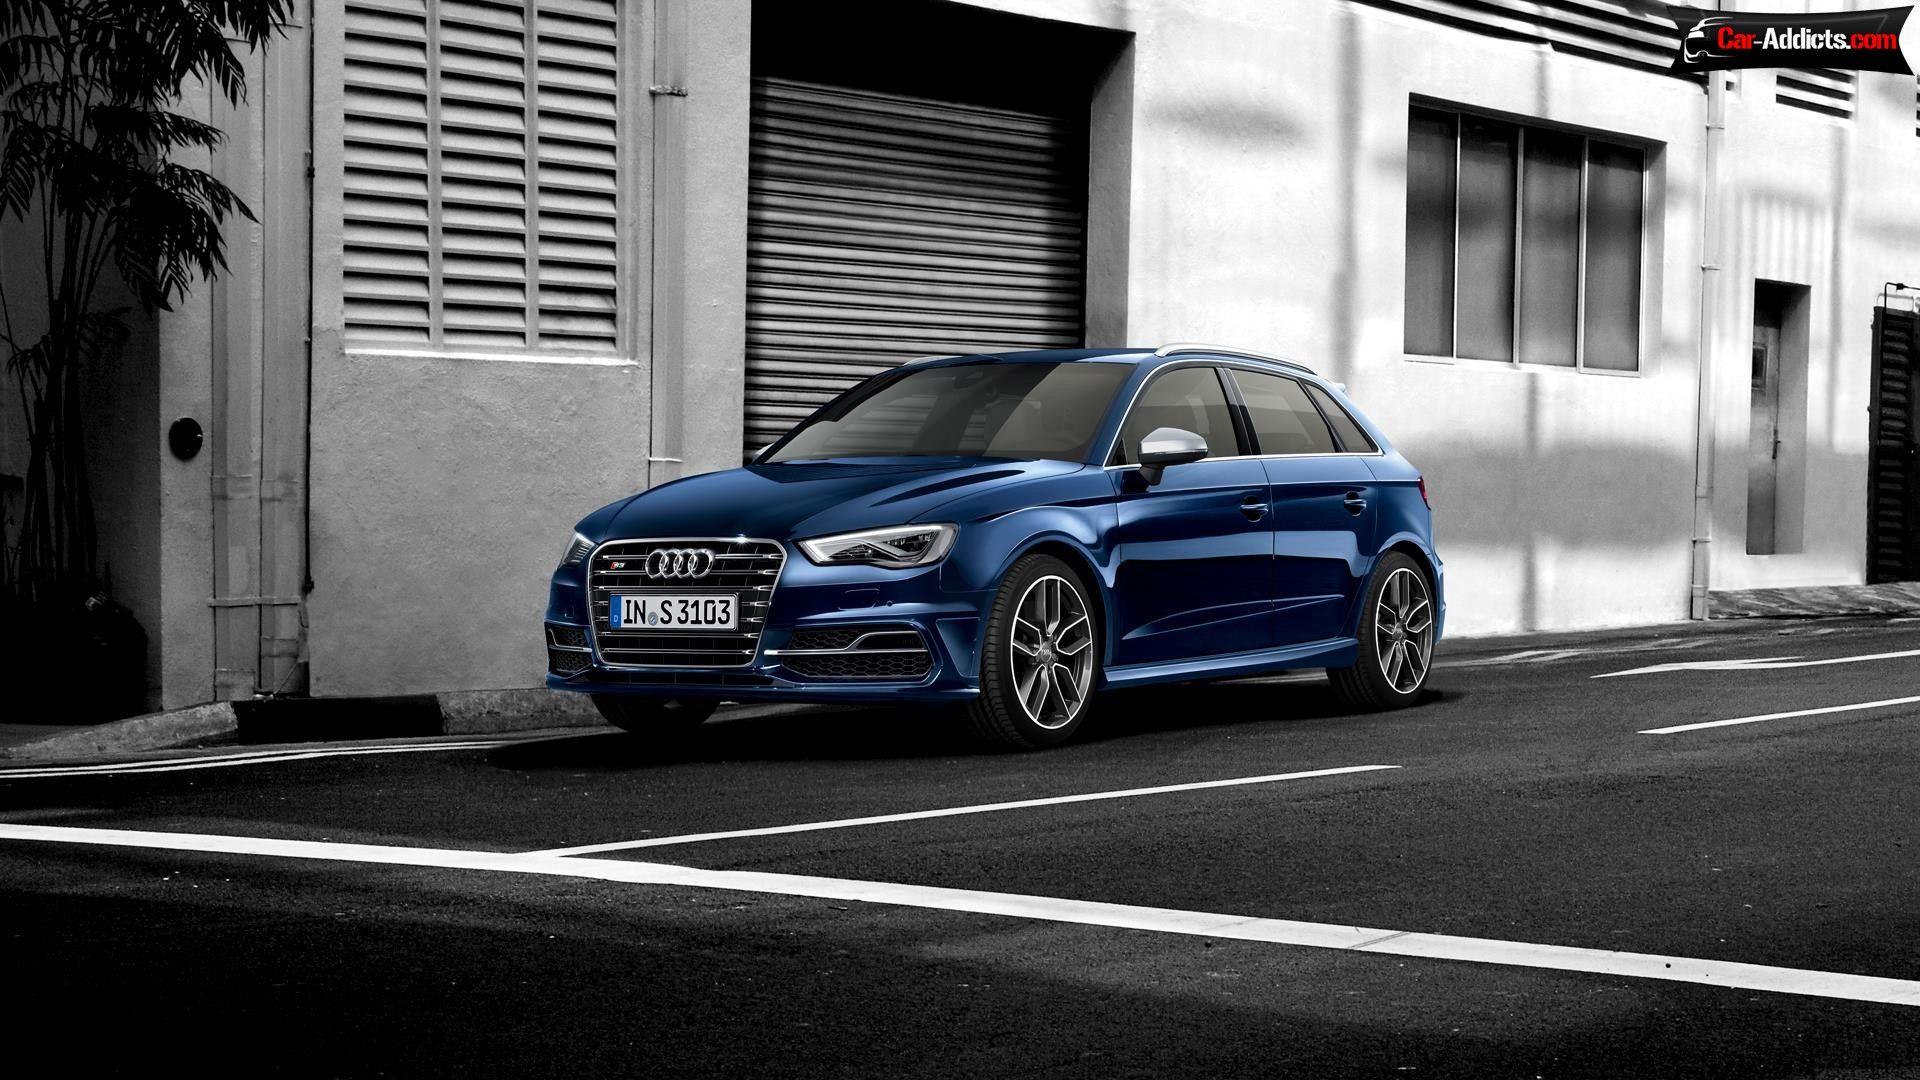 Audi S3 Wallpapers   Top Audi S3 Backgrounds   WallpaperAccess 1920x1080